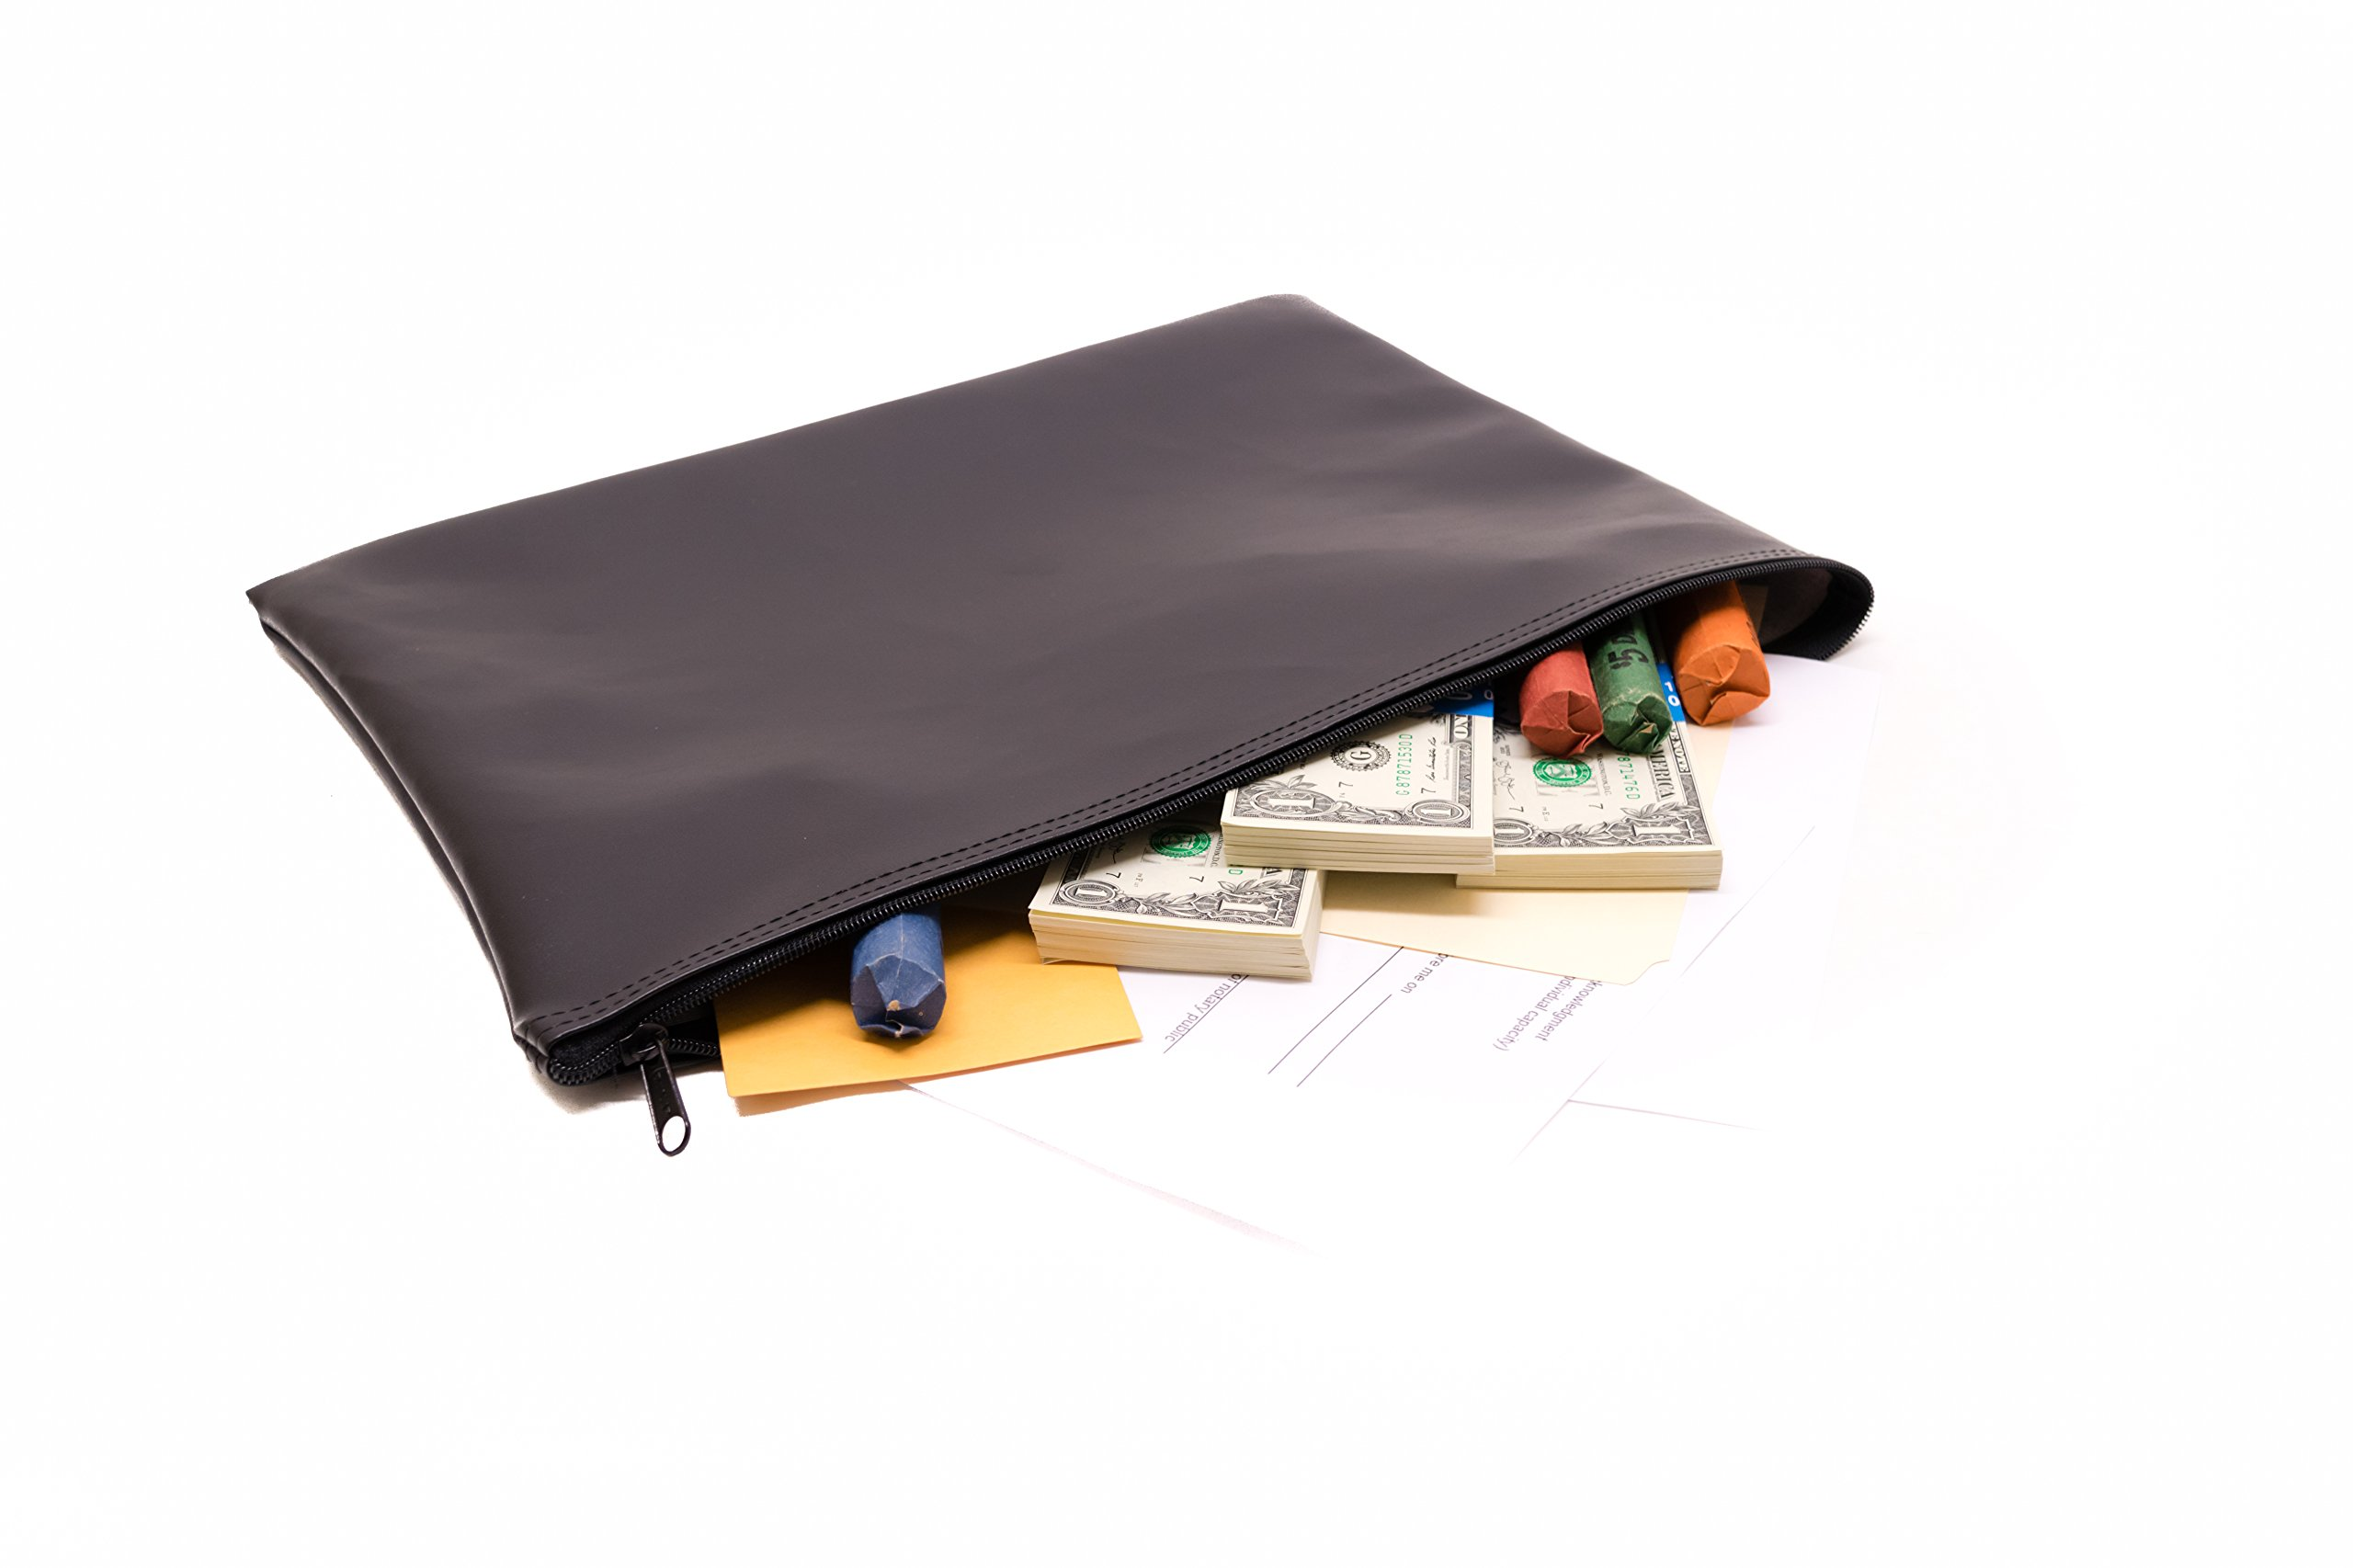 Zipper Bank Deposit Bag 12 X 16 Coin Check Money Wallet Black Pack of 1